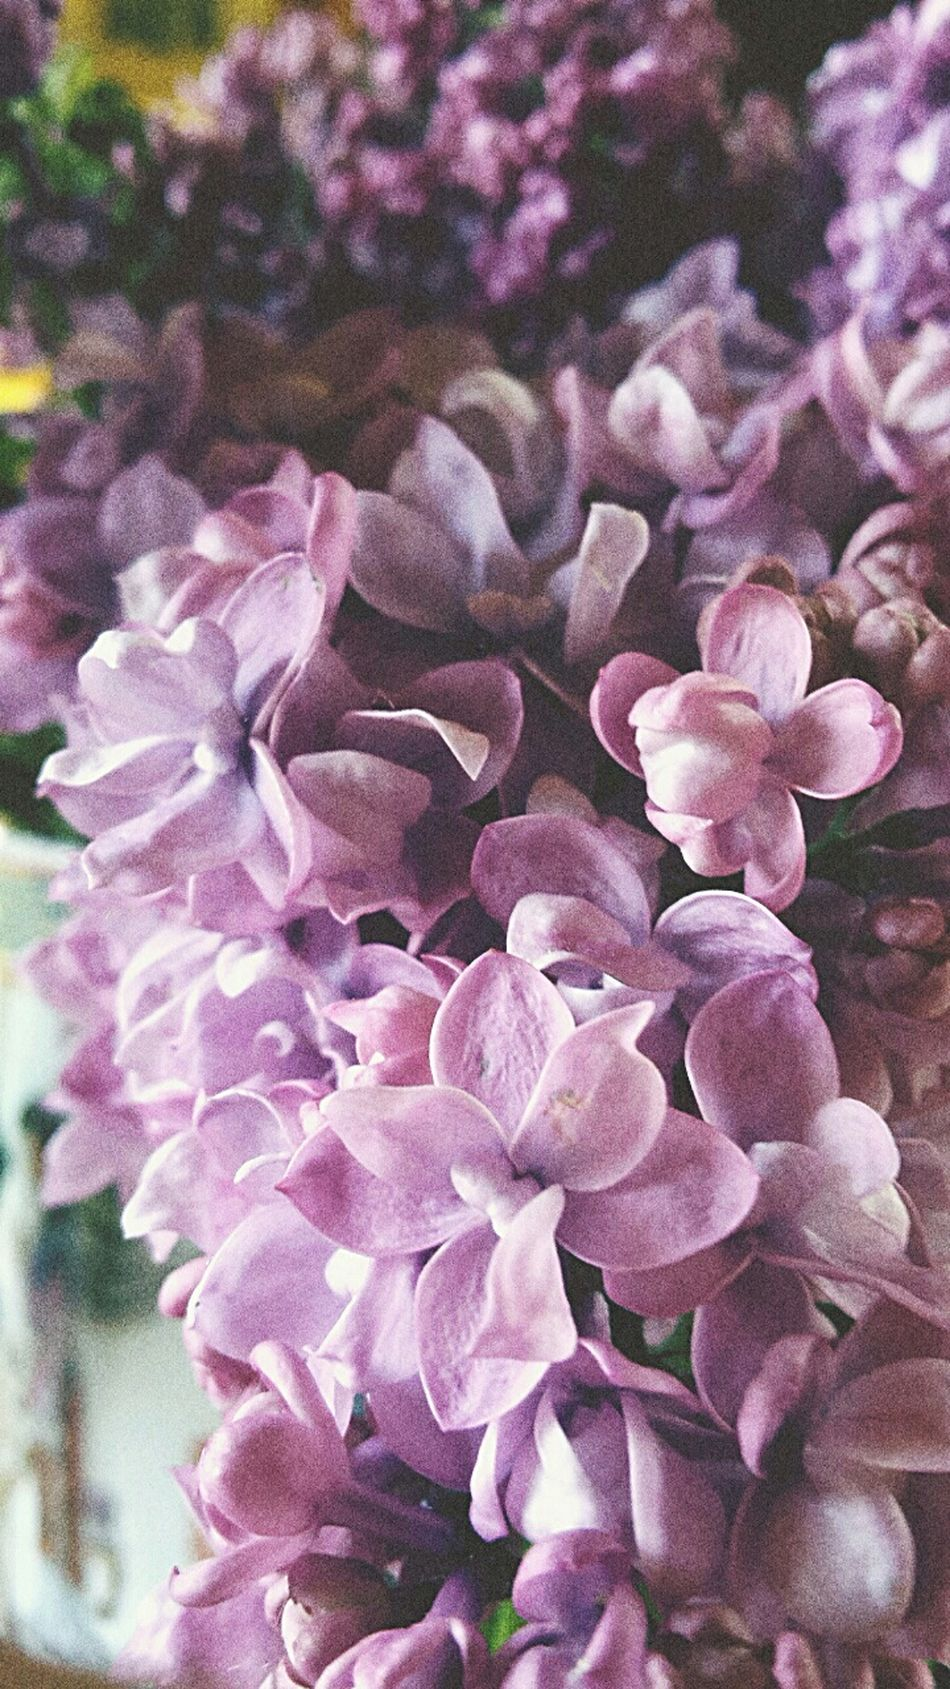 Grany's Lilac Lilac Enjoying Life May Day Moravia